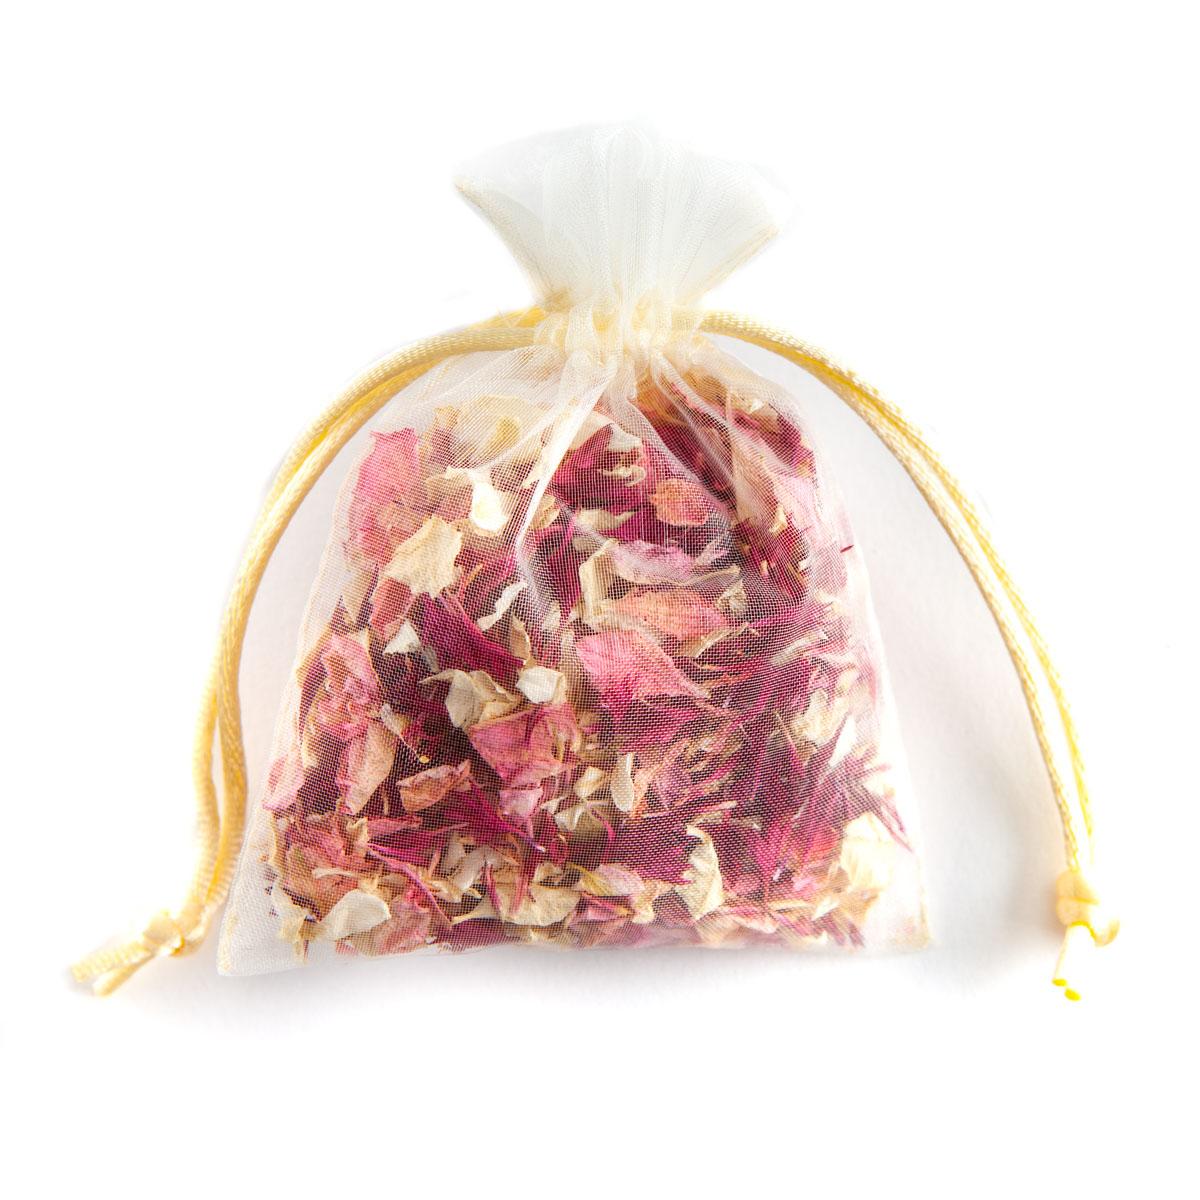 Ruby Twist confetti petals - Biodegradable Confetti - Real Flower Petal Confetti - Petal Bag